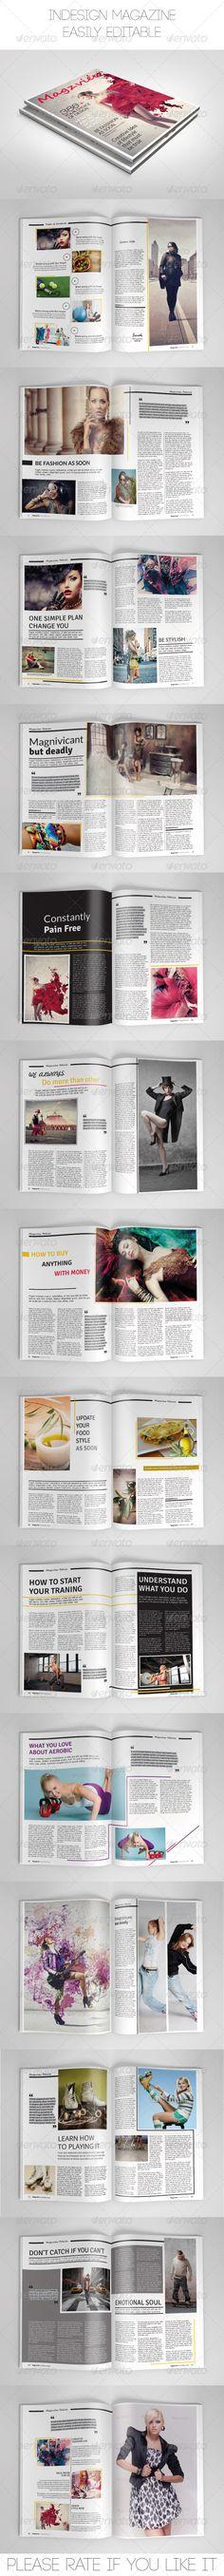 Minimal magazine template | Print templates, Magazines and Indesign ...